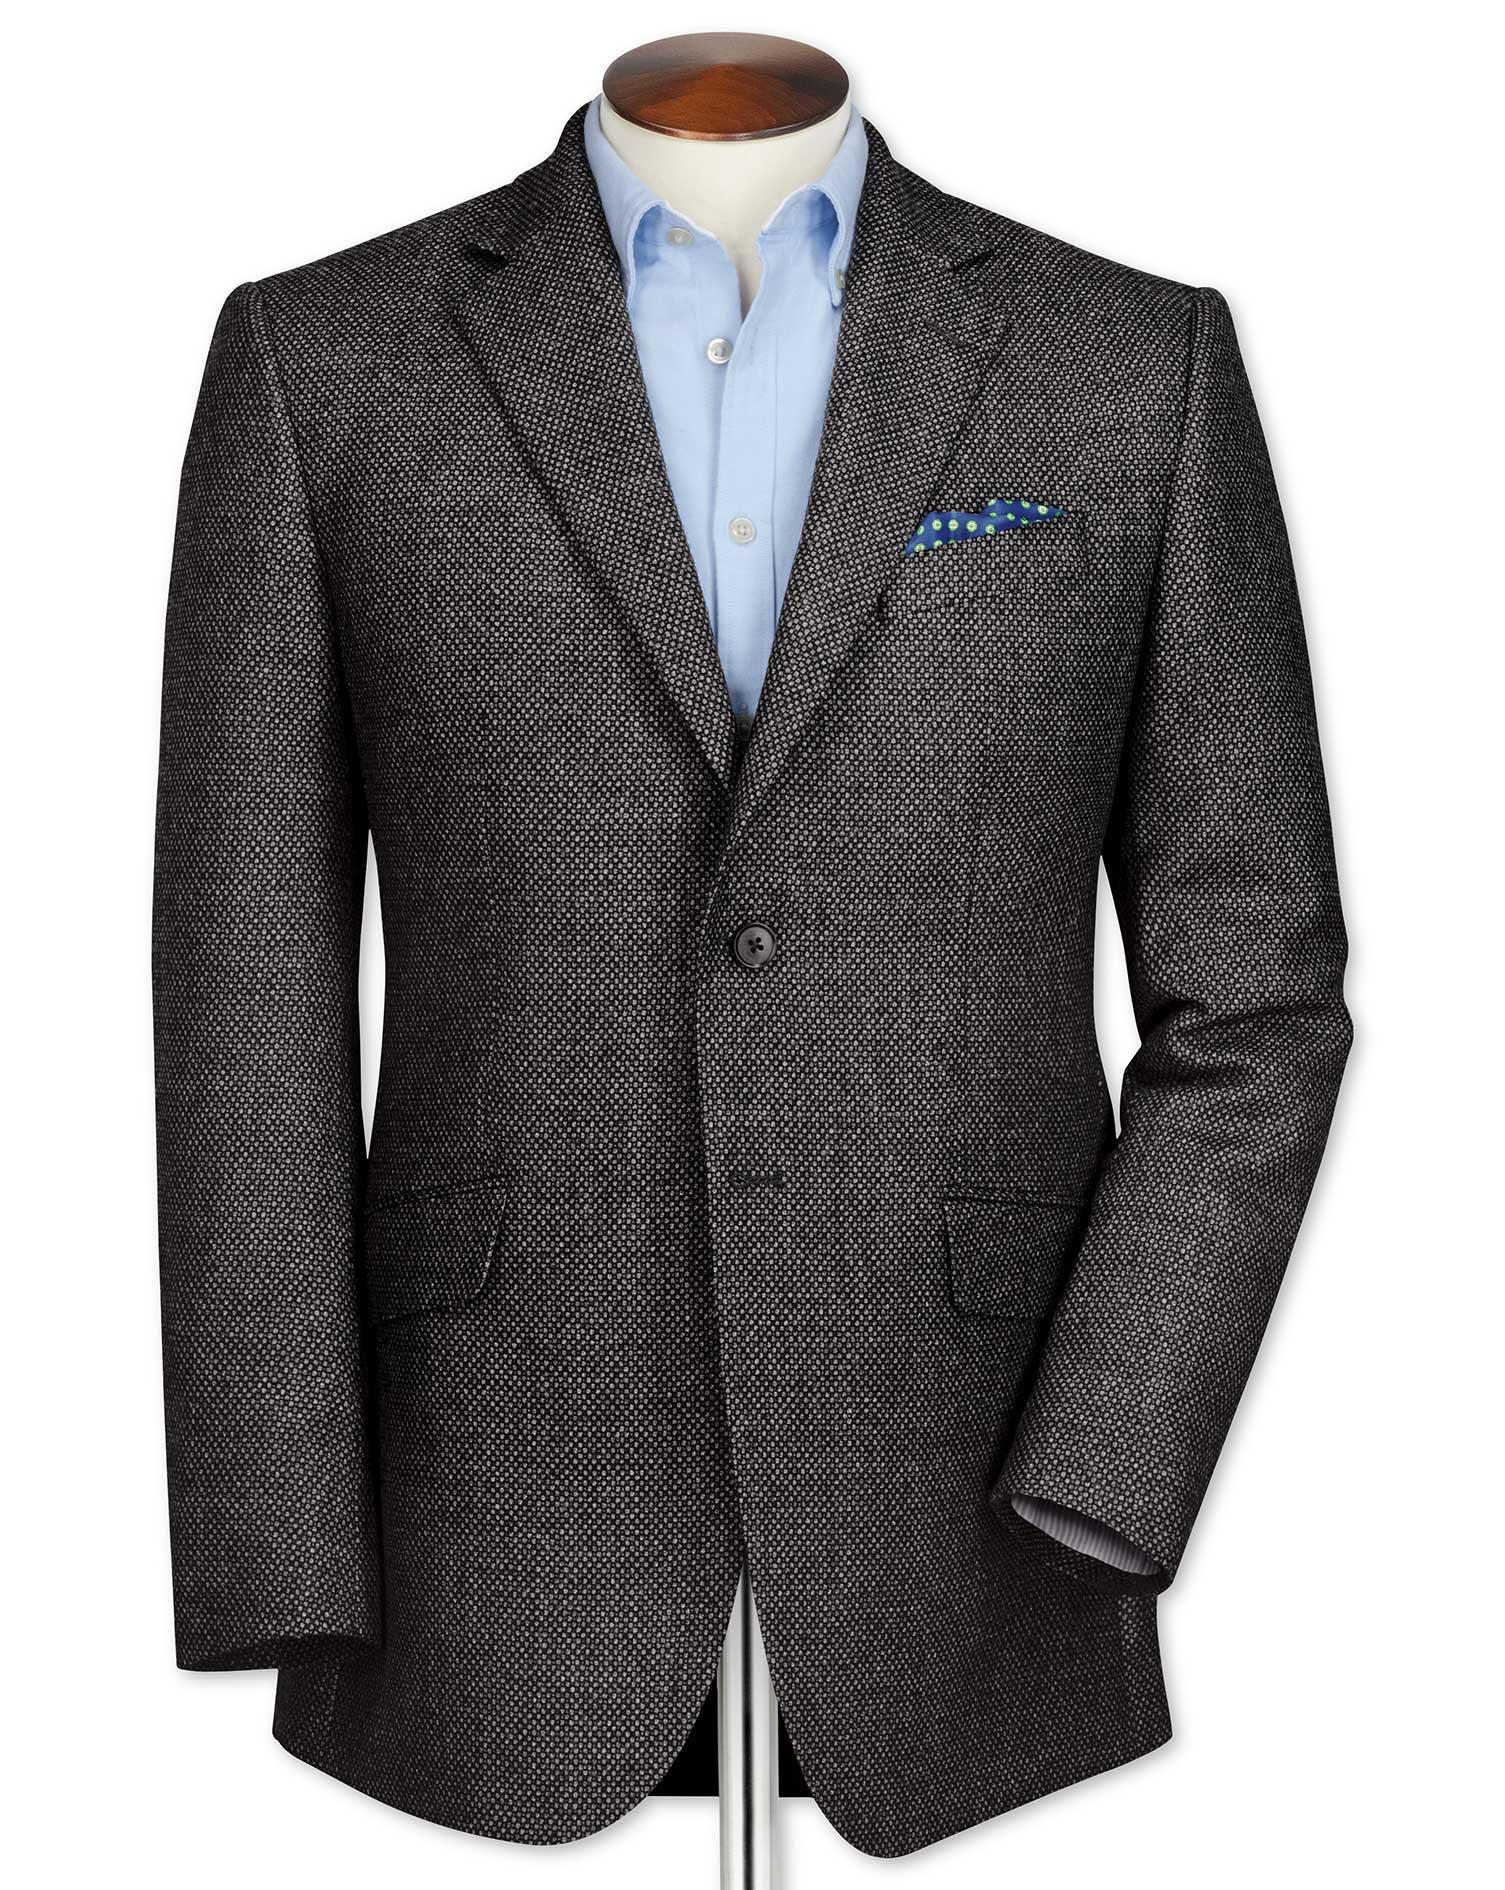 Classic Fit Grey Birdseye Lambswool Wool Jacket Size 40 Regular by Charles Tyrwhitt